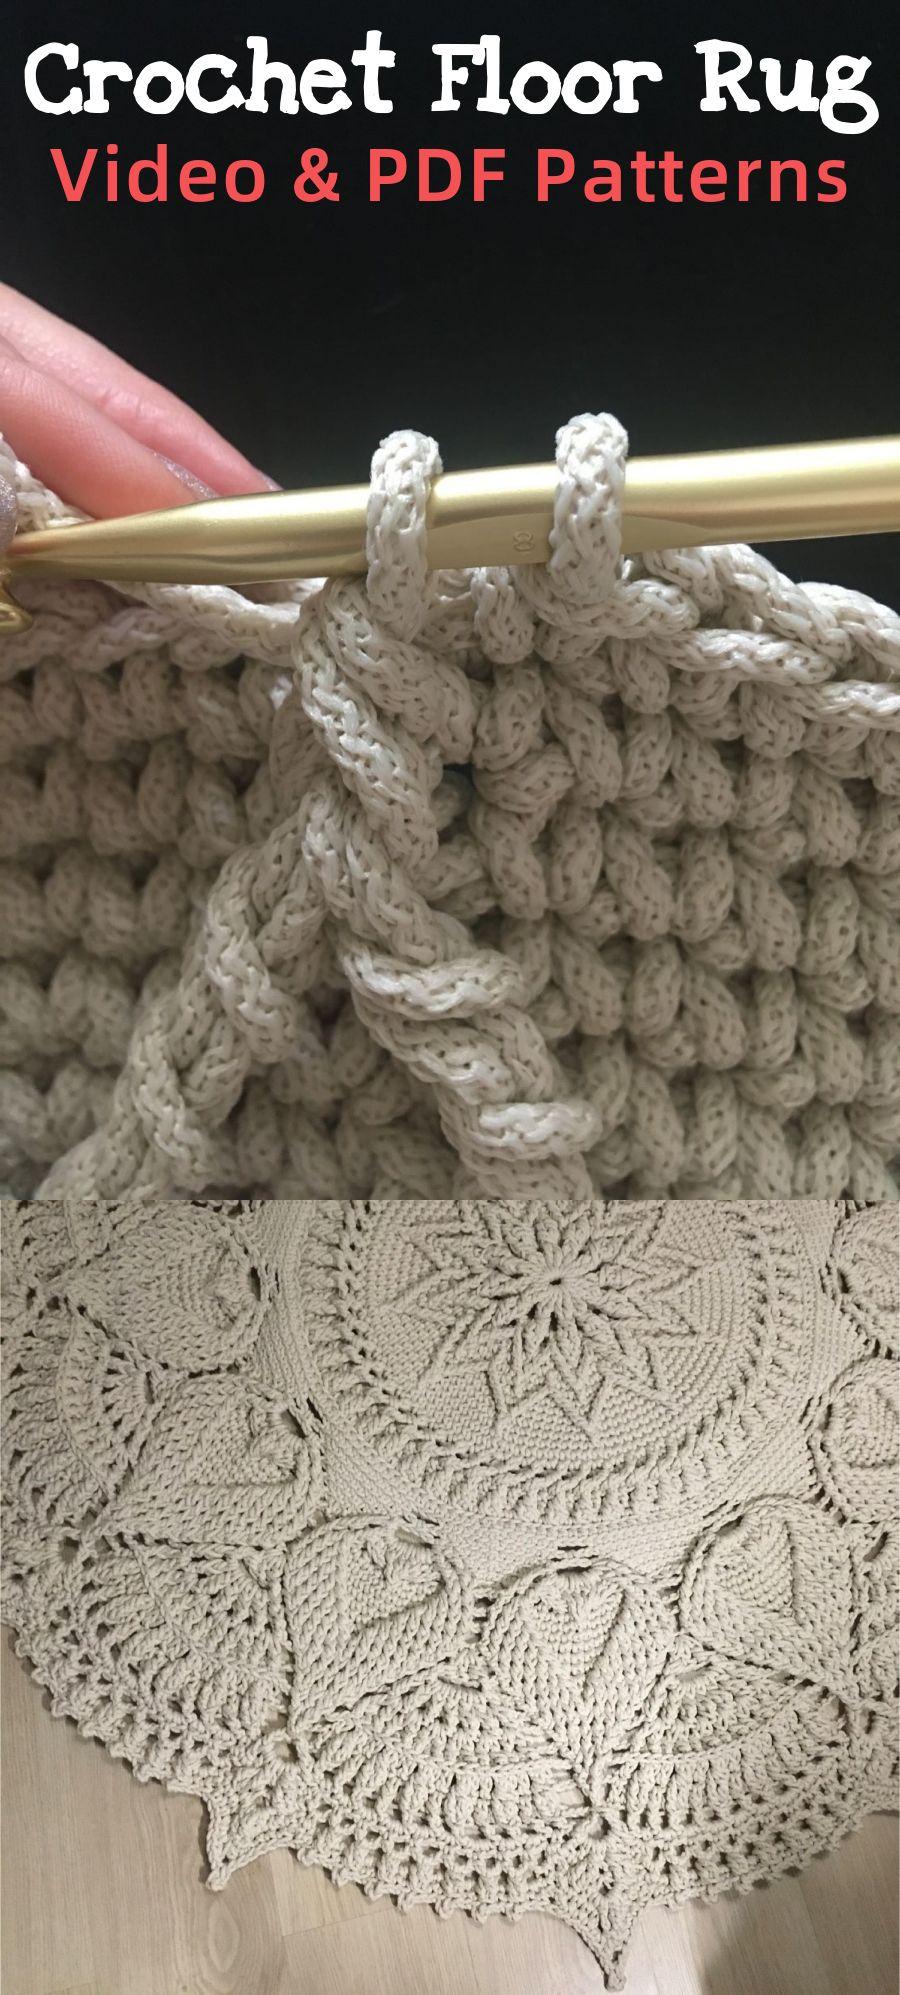 Video Tutorial Crocheting Rug Fox Text Description In Etsy In 2020 Crochet Rug Crochet Mat Crochet